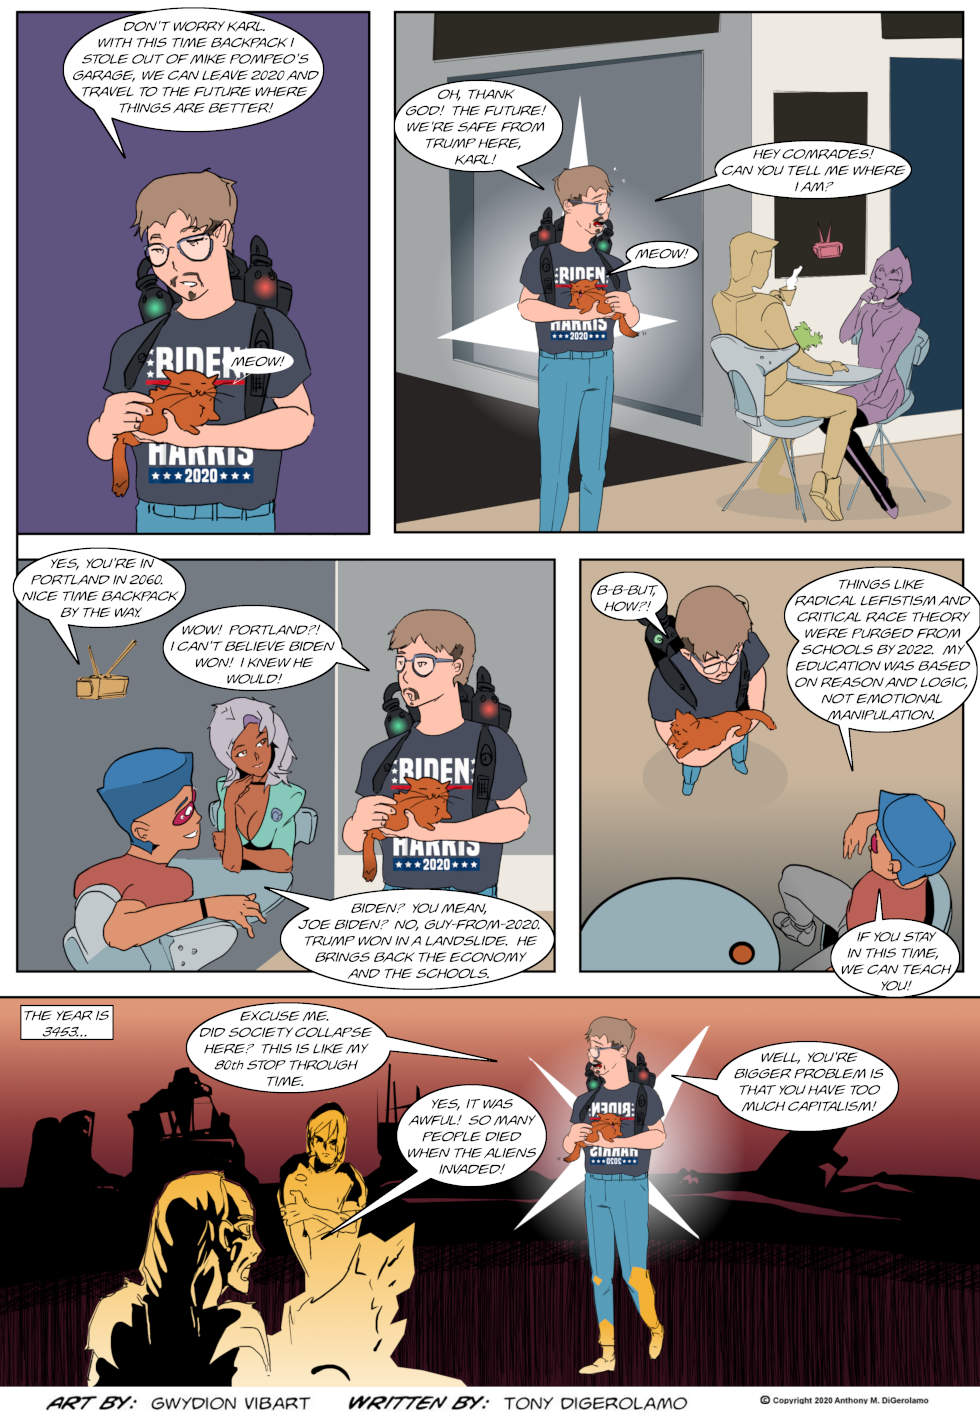 The Antiwar Comic:  A Timeless Idiocy